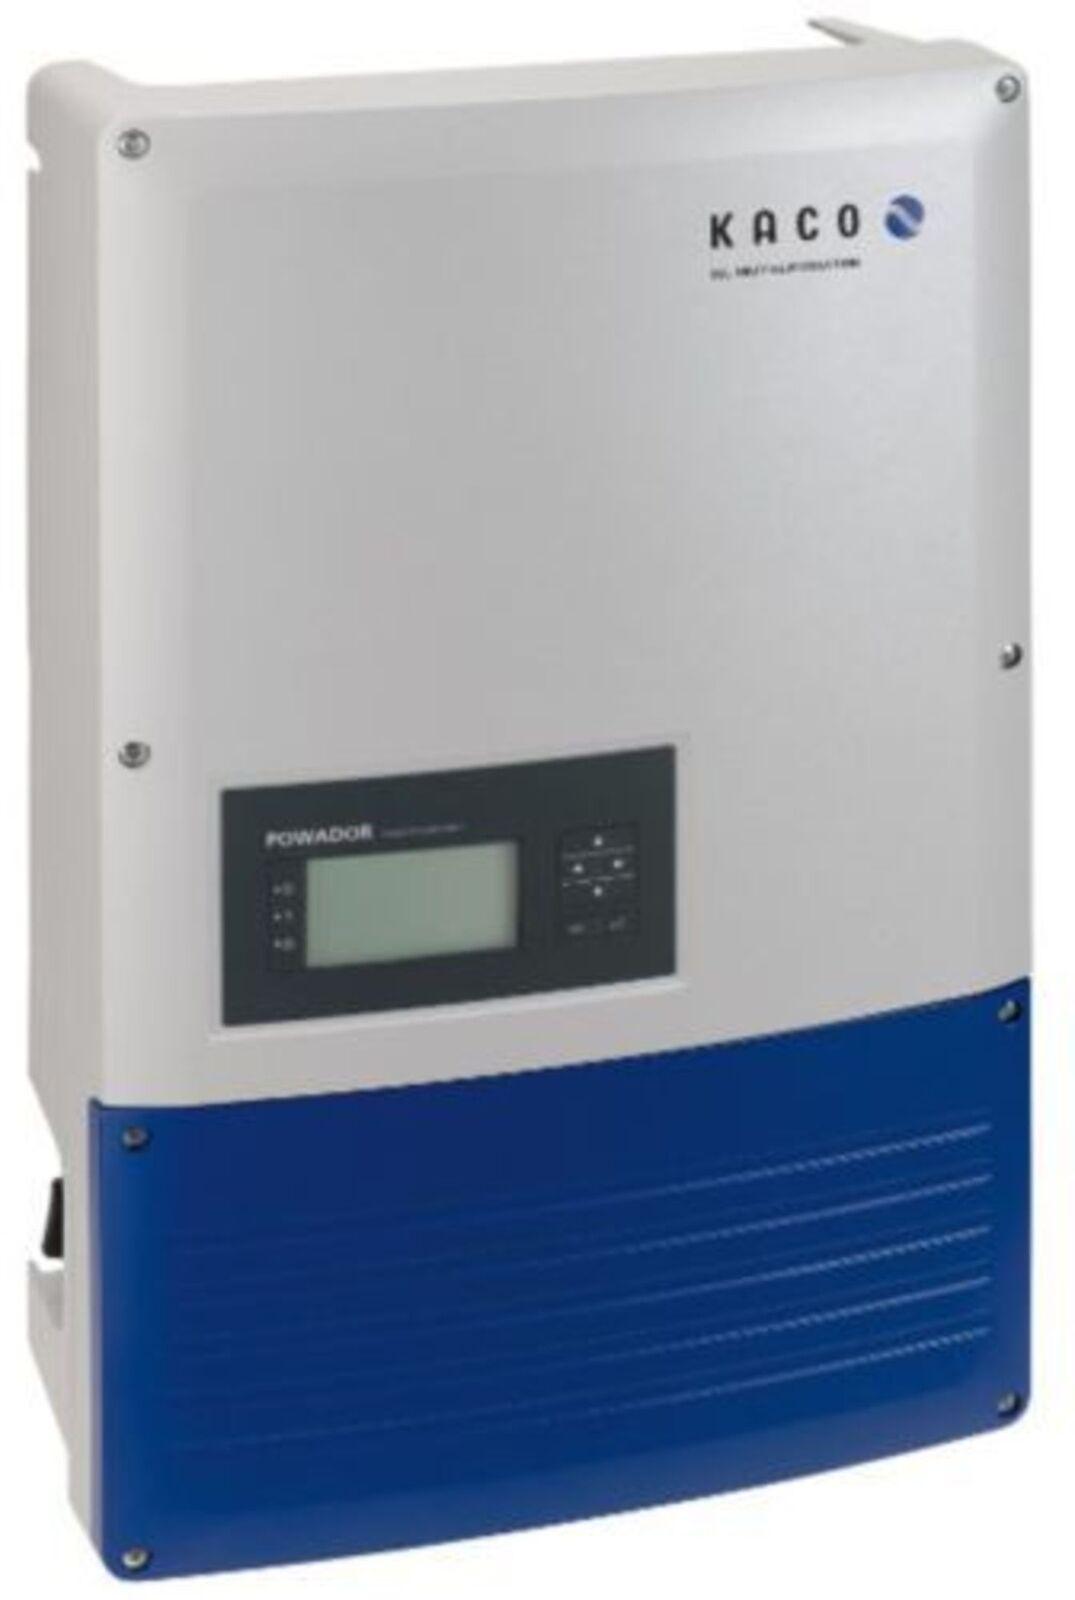 Kaco Blauplanet 20KW TL3 SPD NEU Wechselrichter Photovoltaik Solar PV Inverter